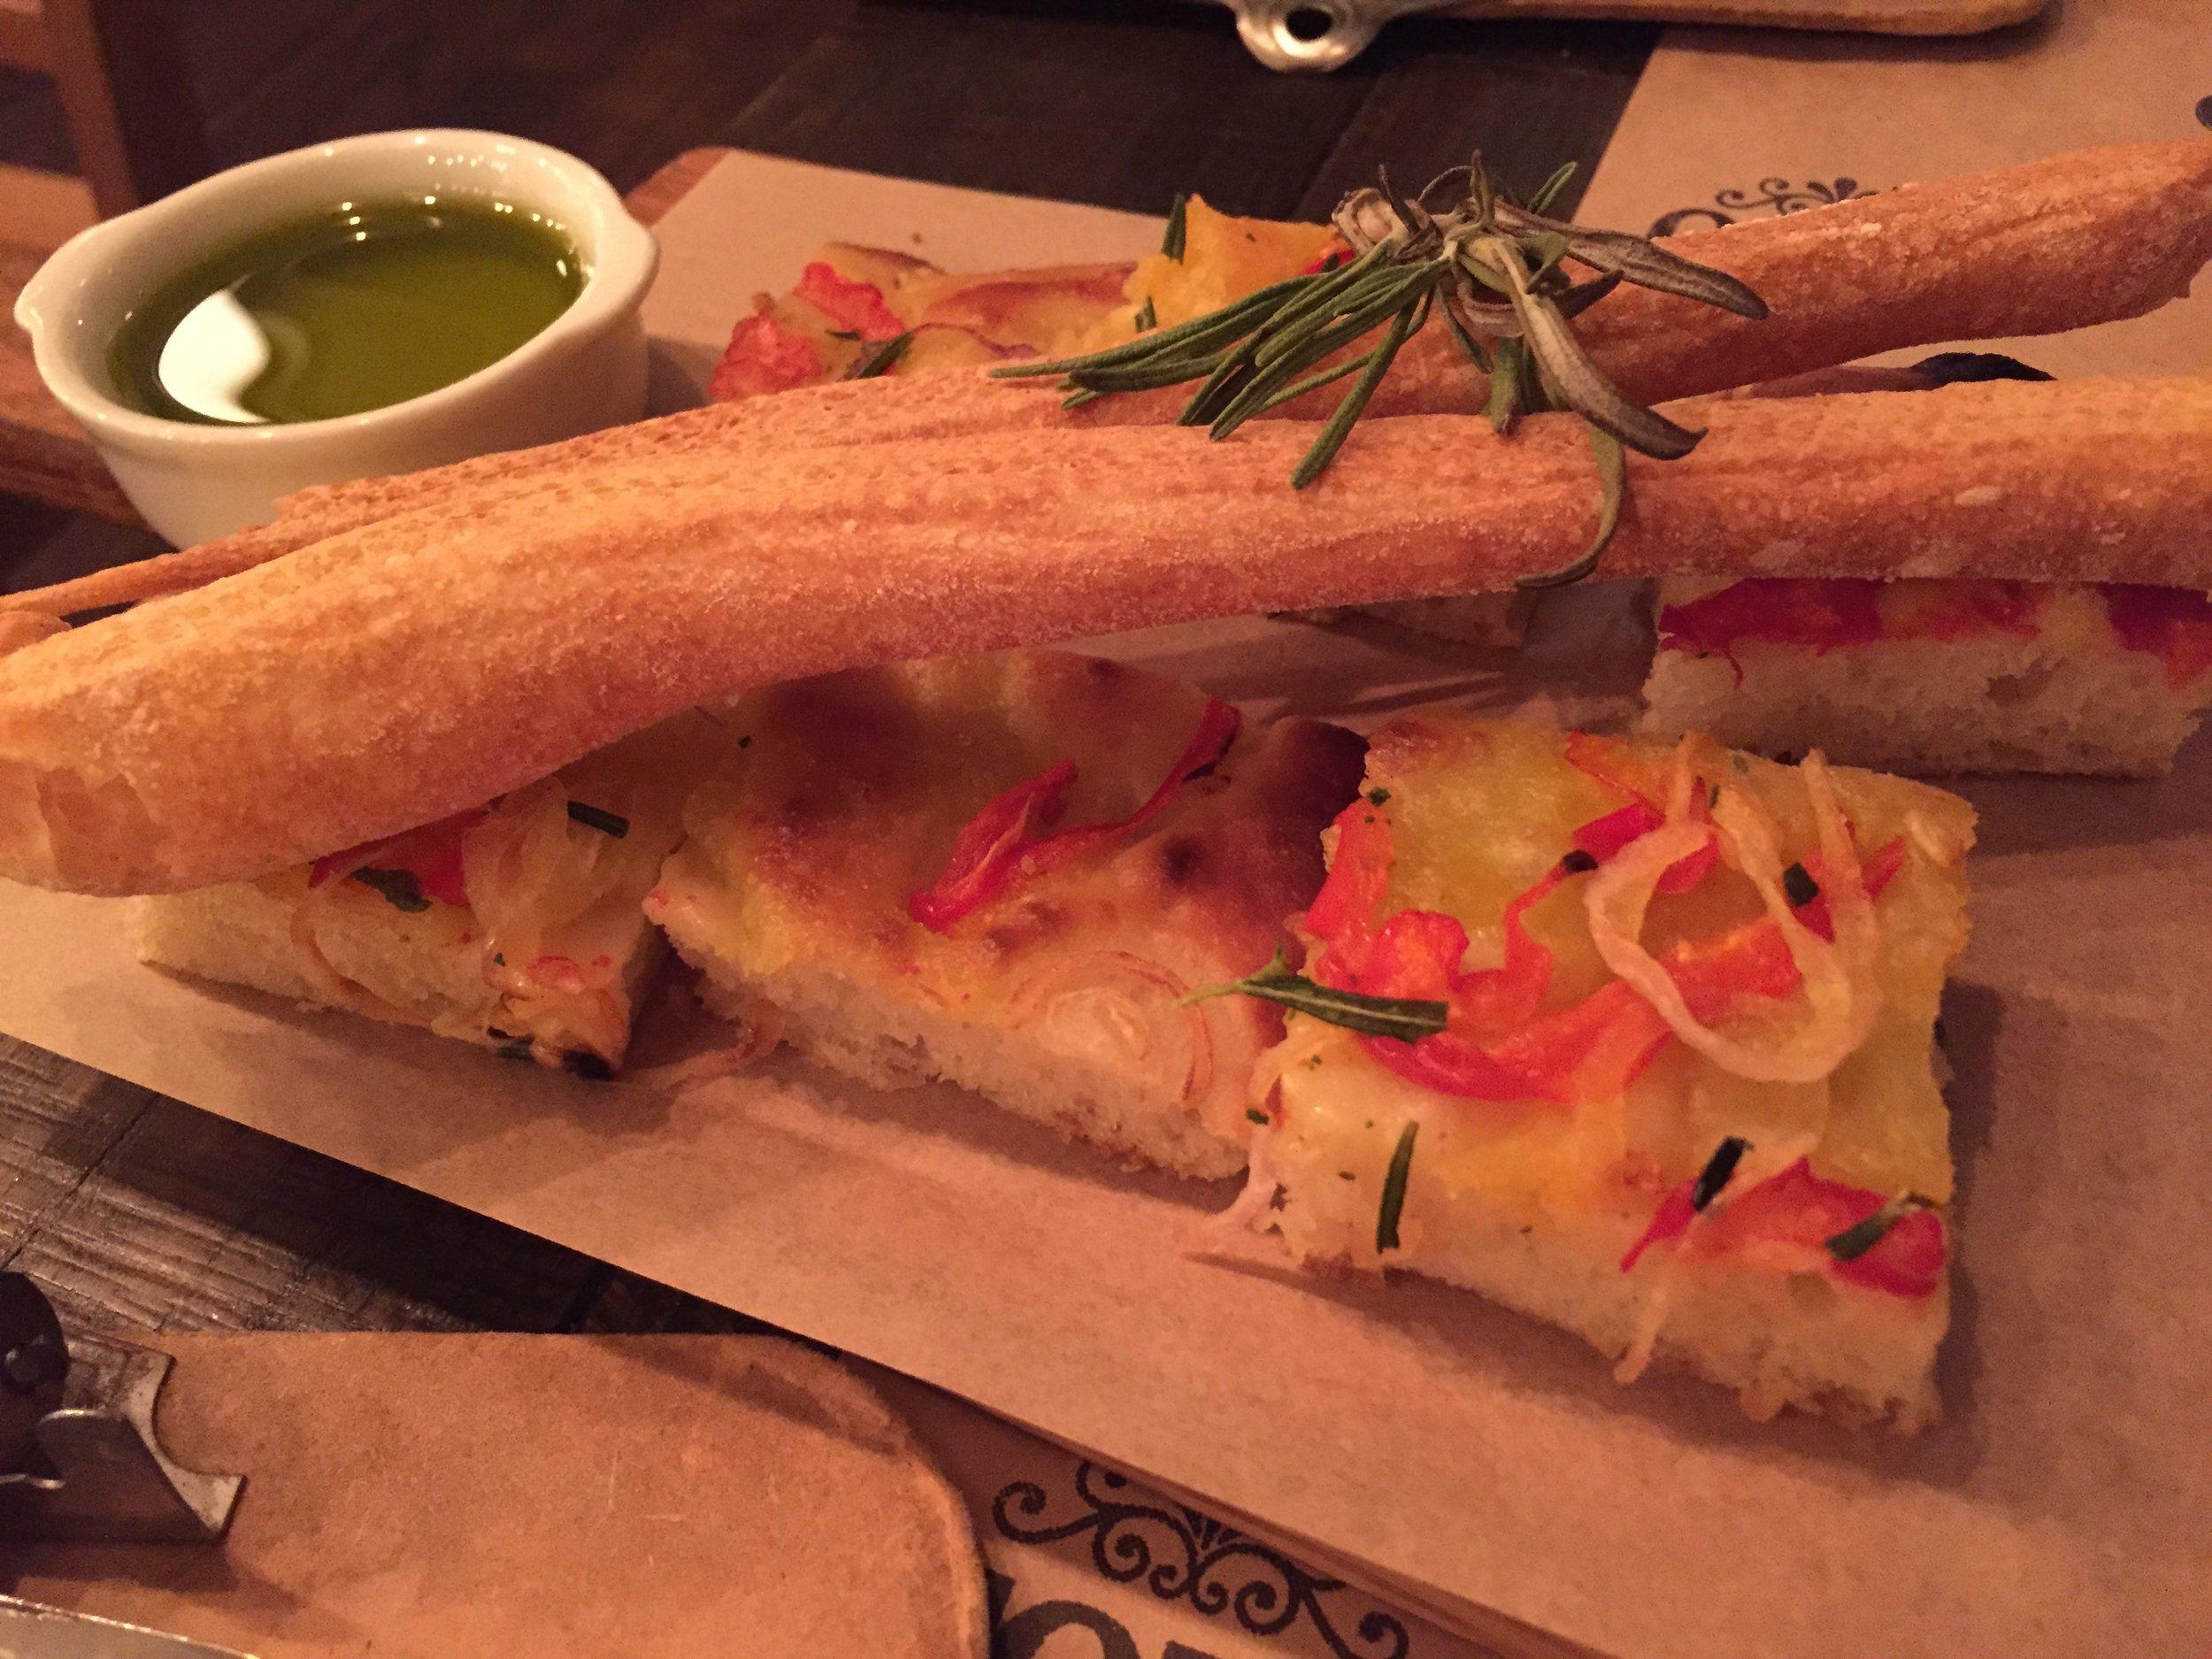 barcelona-toto-restaurant-bread-course-spain.jpg